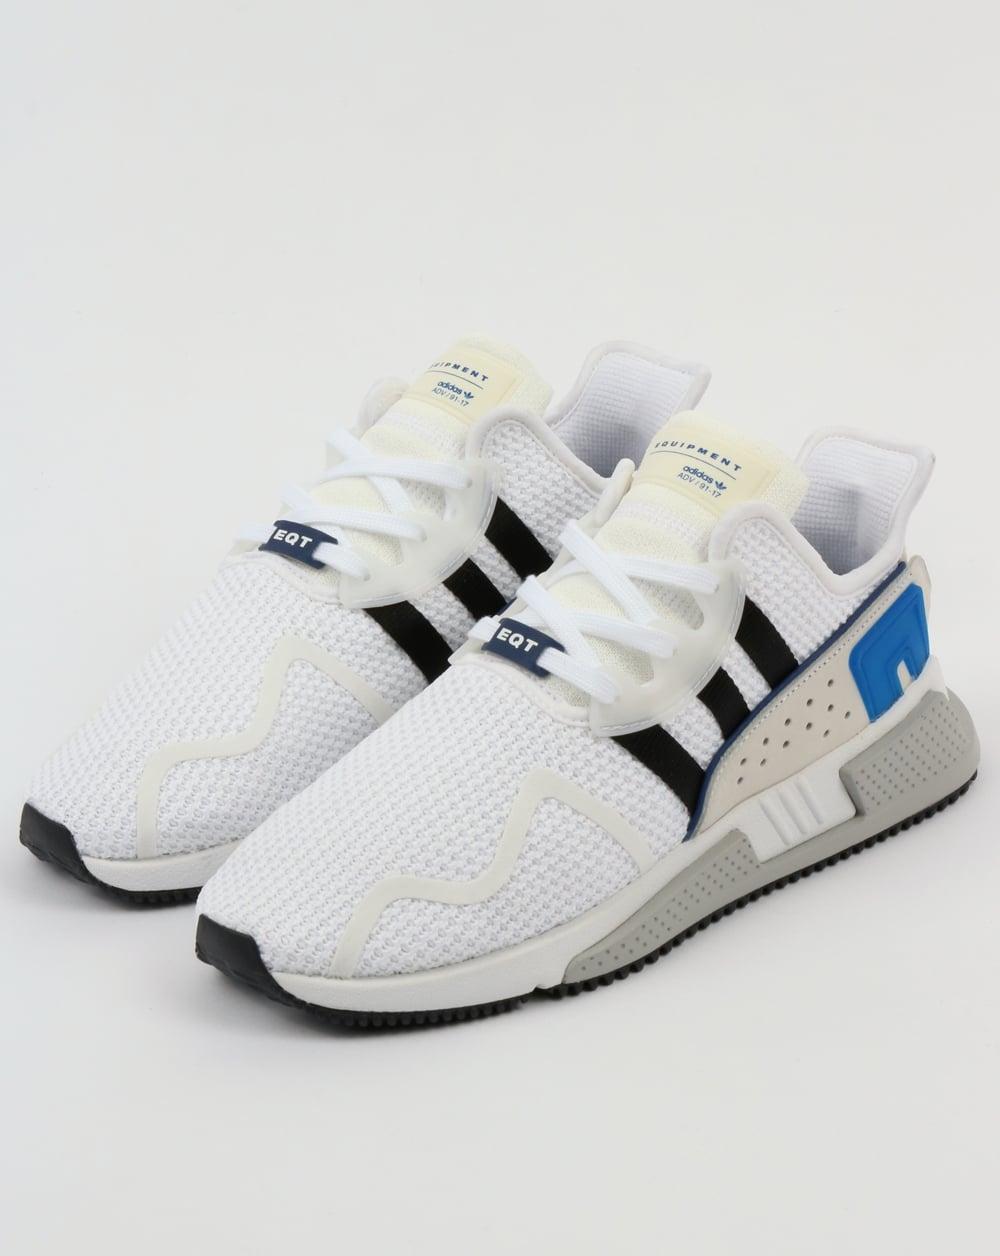 premium selection 894bd 29d4a ... adidas eqt cushion adv trainers white black royal